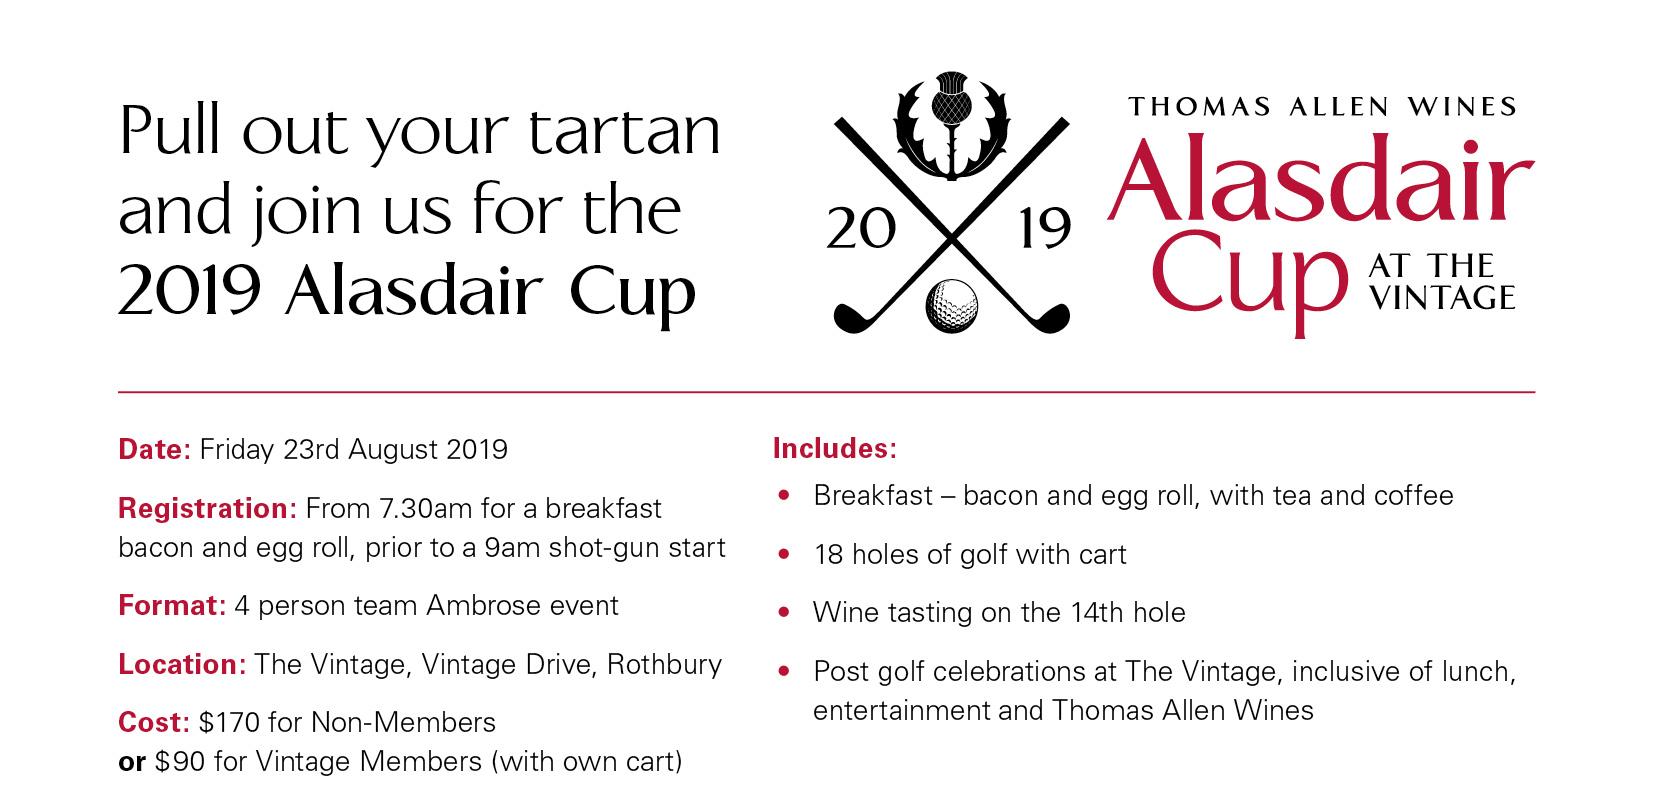 2019 Alasdair Cup Invitation 01